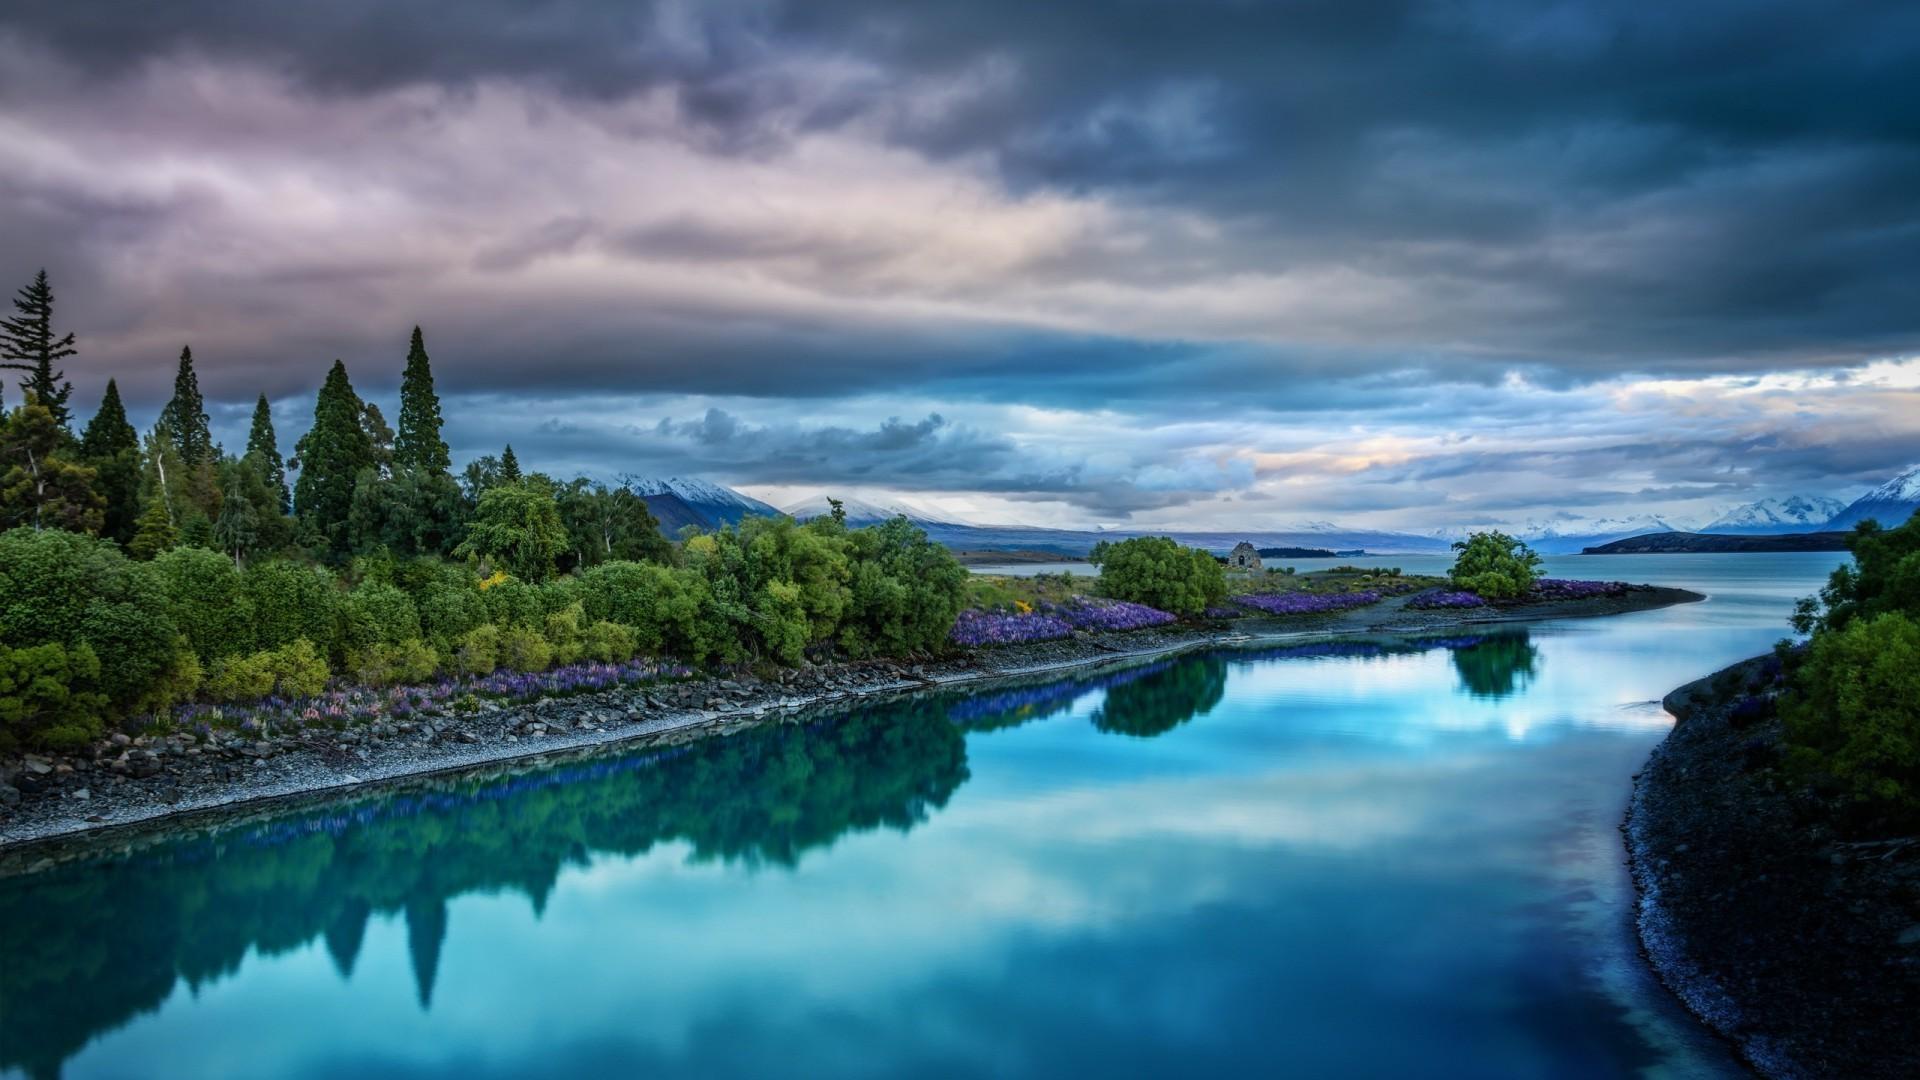 Nature, Landscape, River, Clouds, Trees, Reflections, - Calm Wallpaper River , HD Wallpaper & Backgrounds